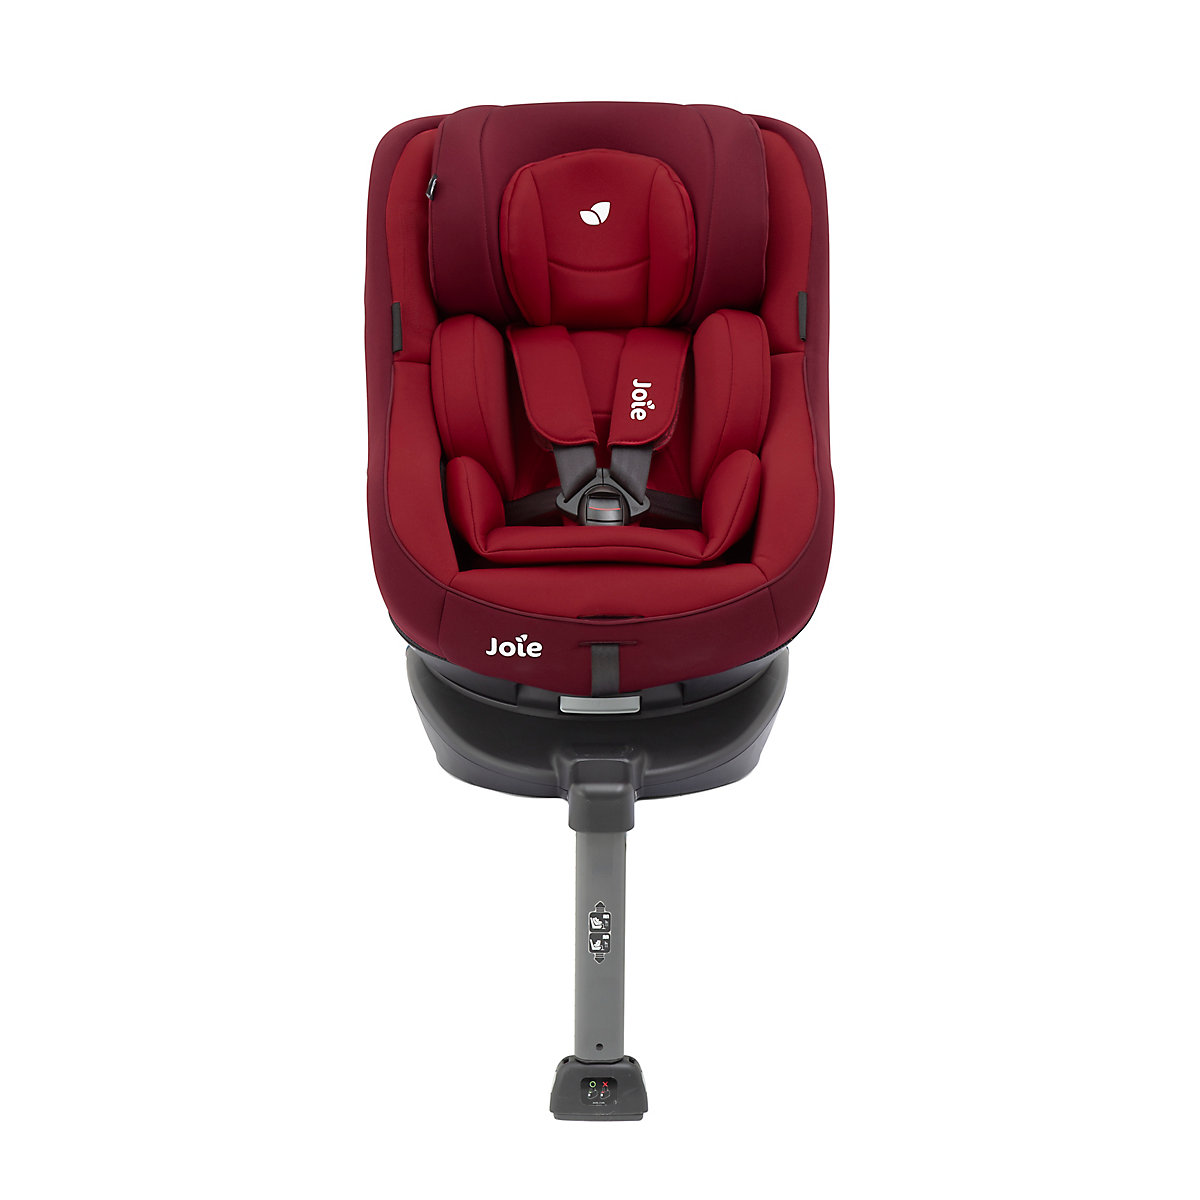 joie spin 360 car seat merlot car seat compare. Black Bedroom Furniture Sets. Home Design Ideas